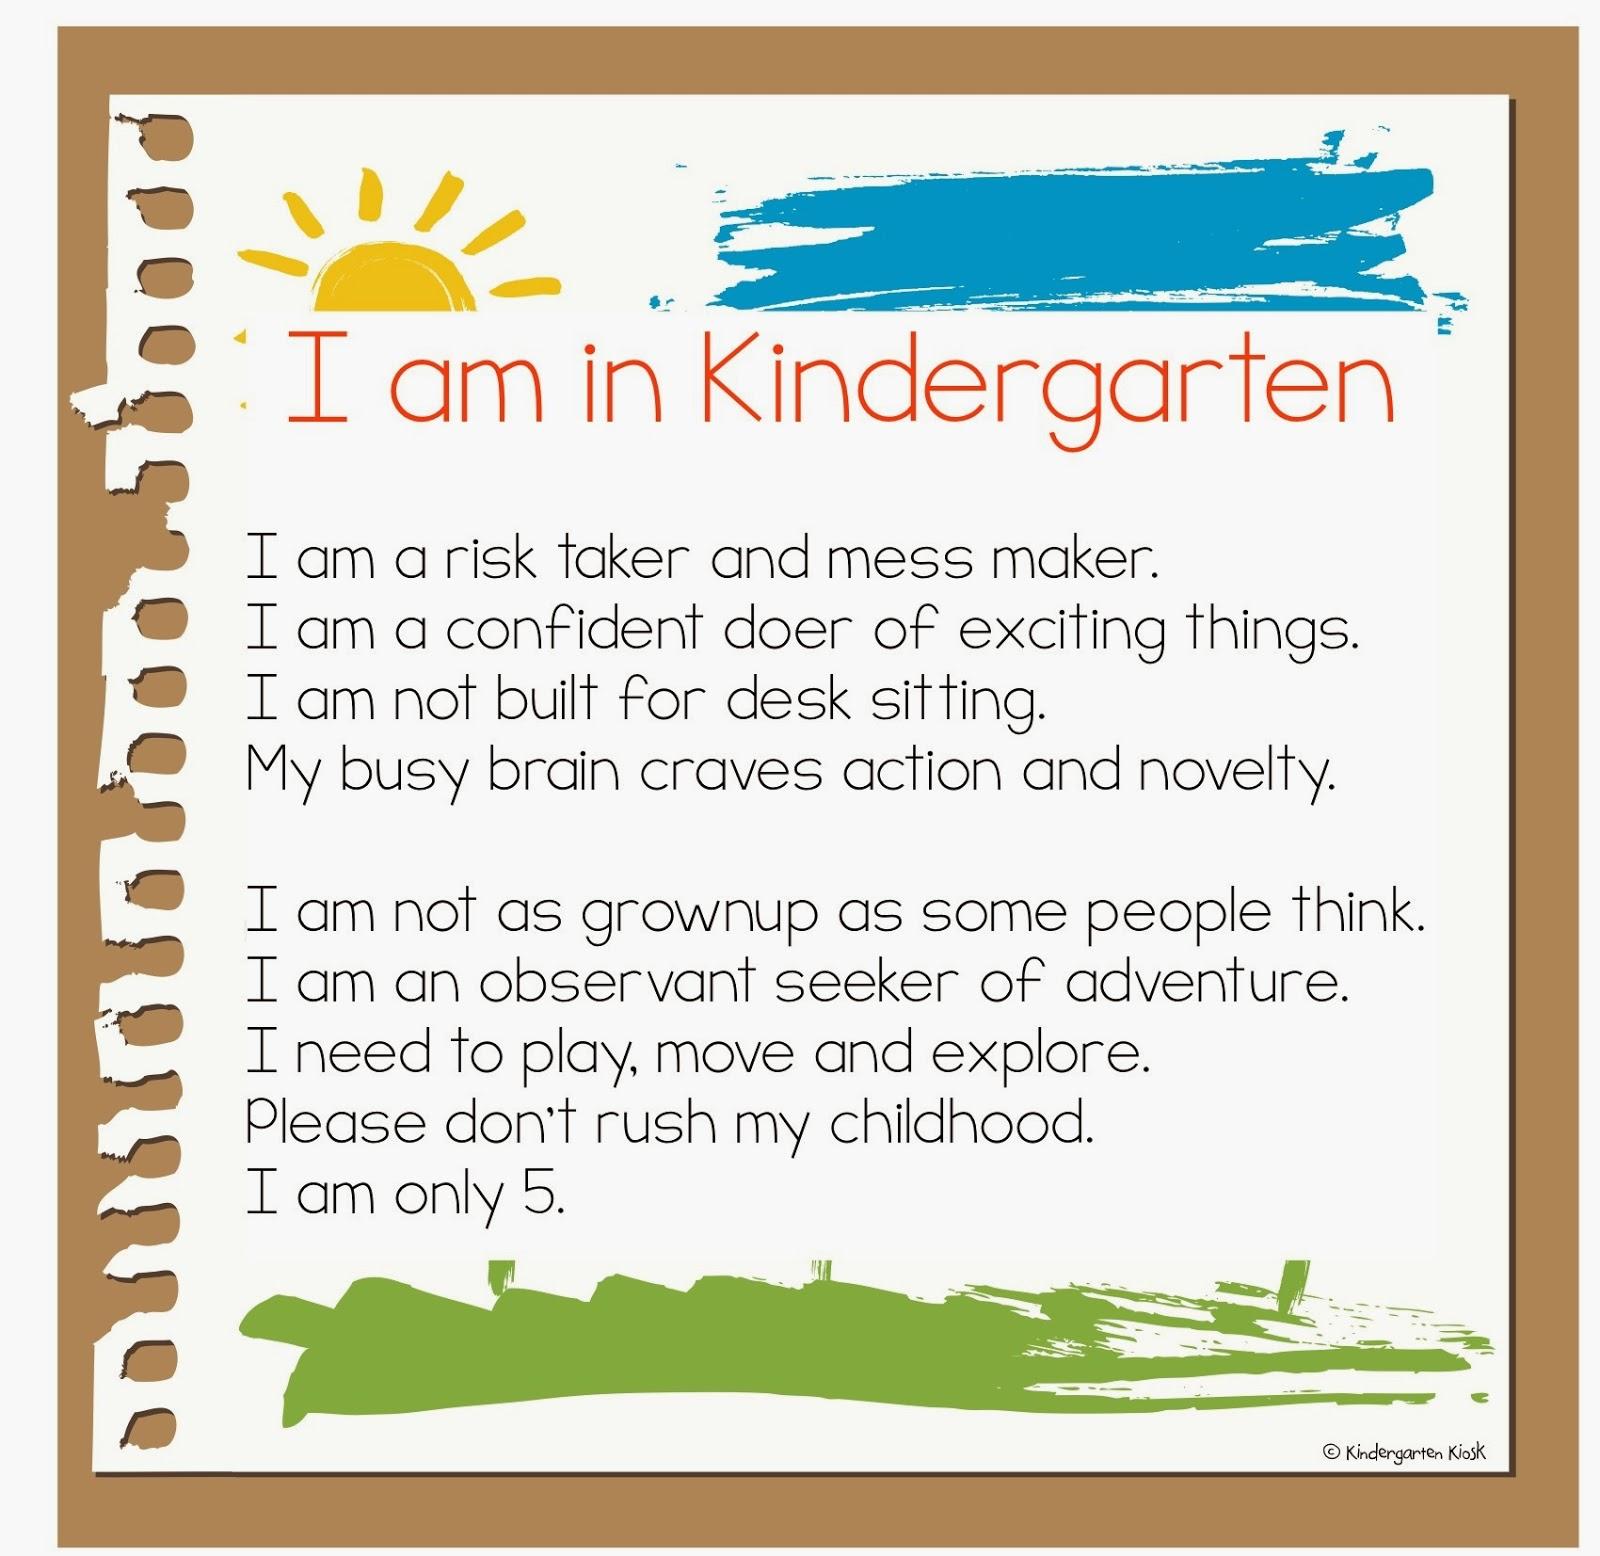 Kindergarten Kiosk Justifying Kindergarten Play